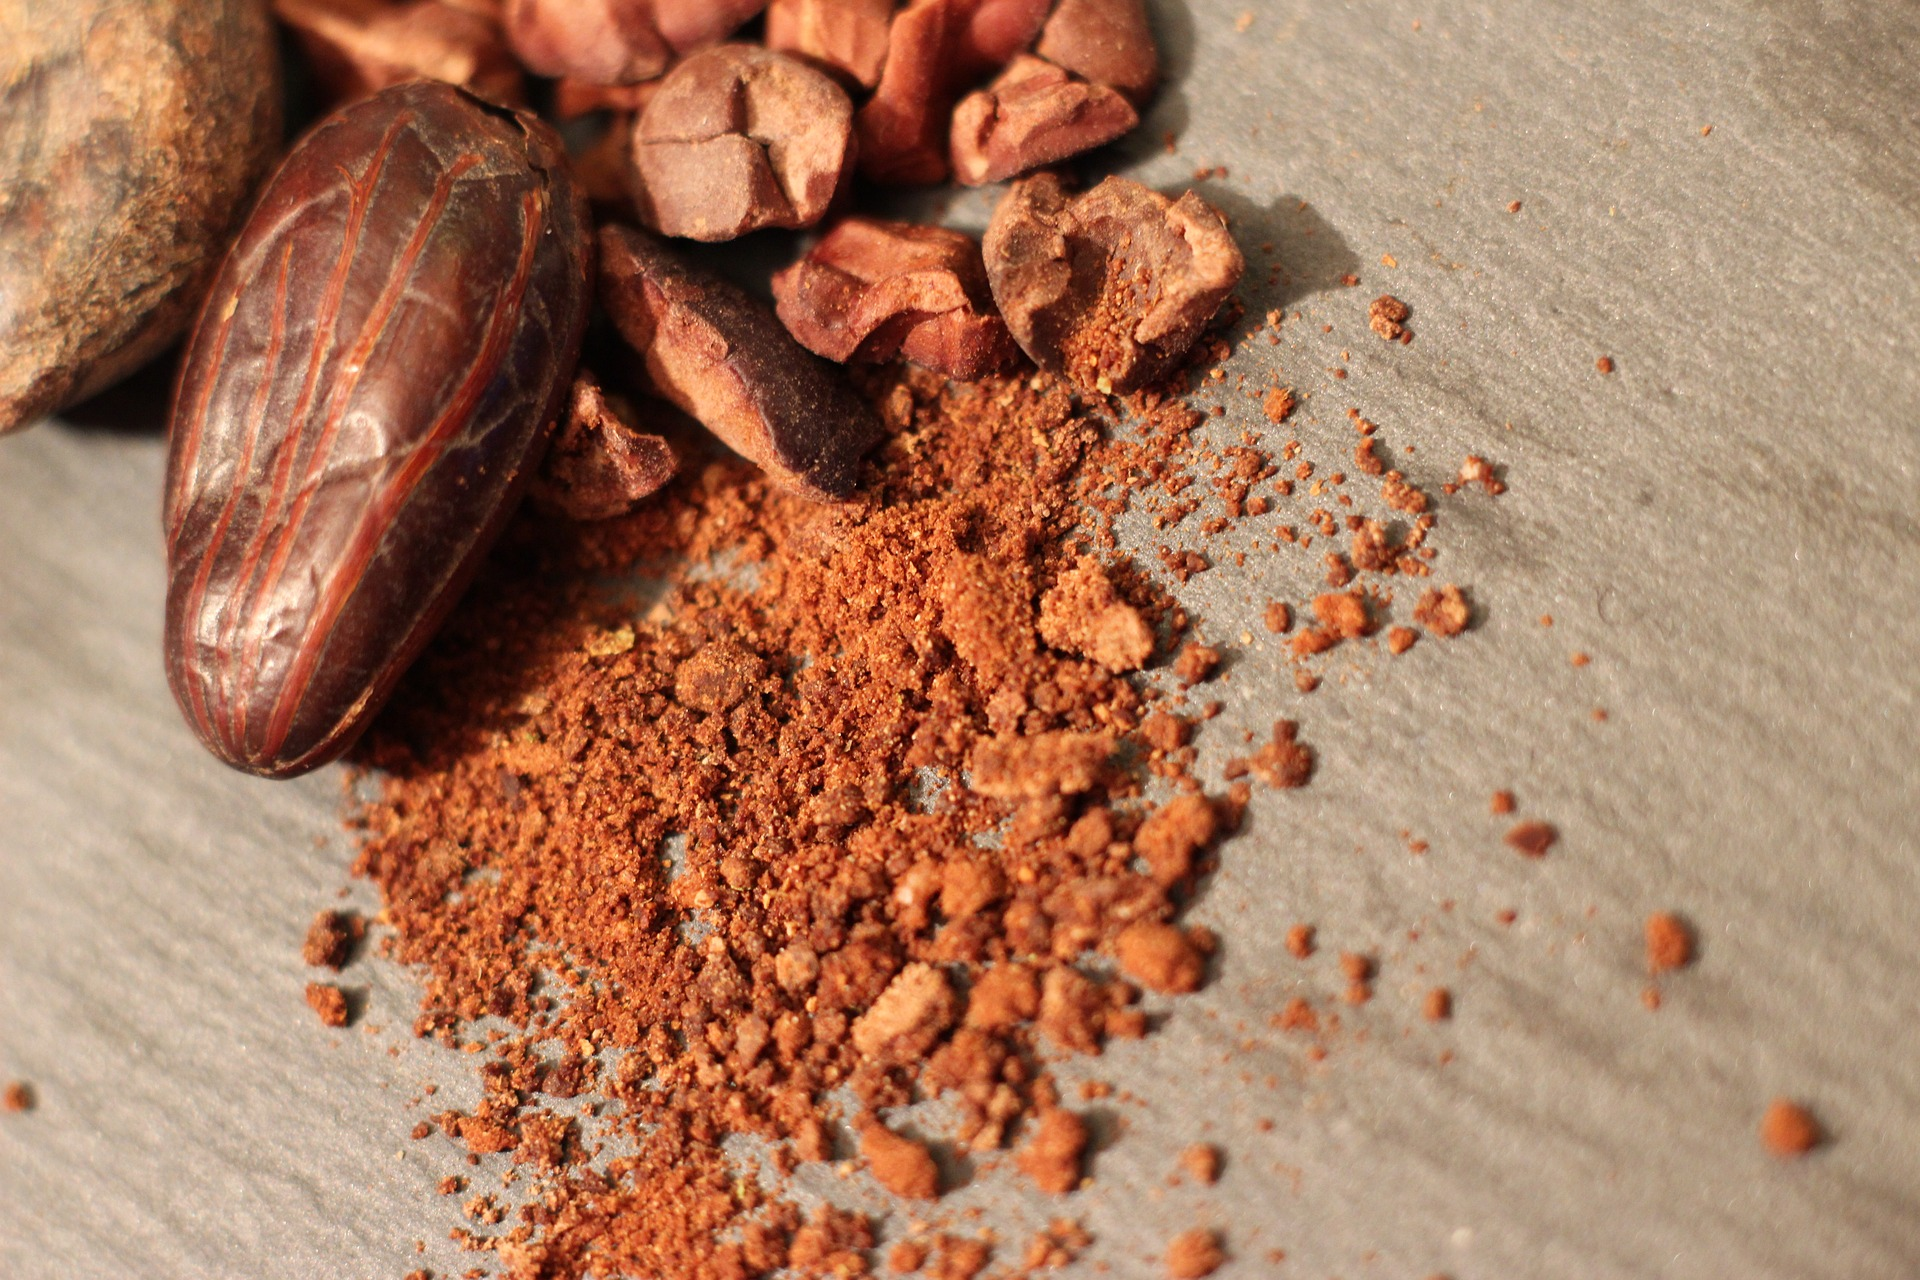 cocoa-powder 3005624_1920.jpg